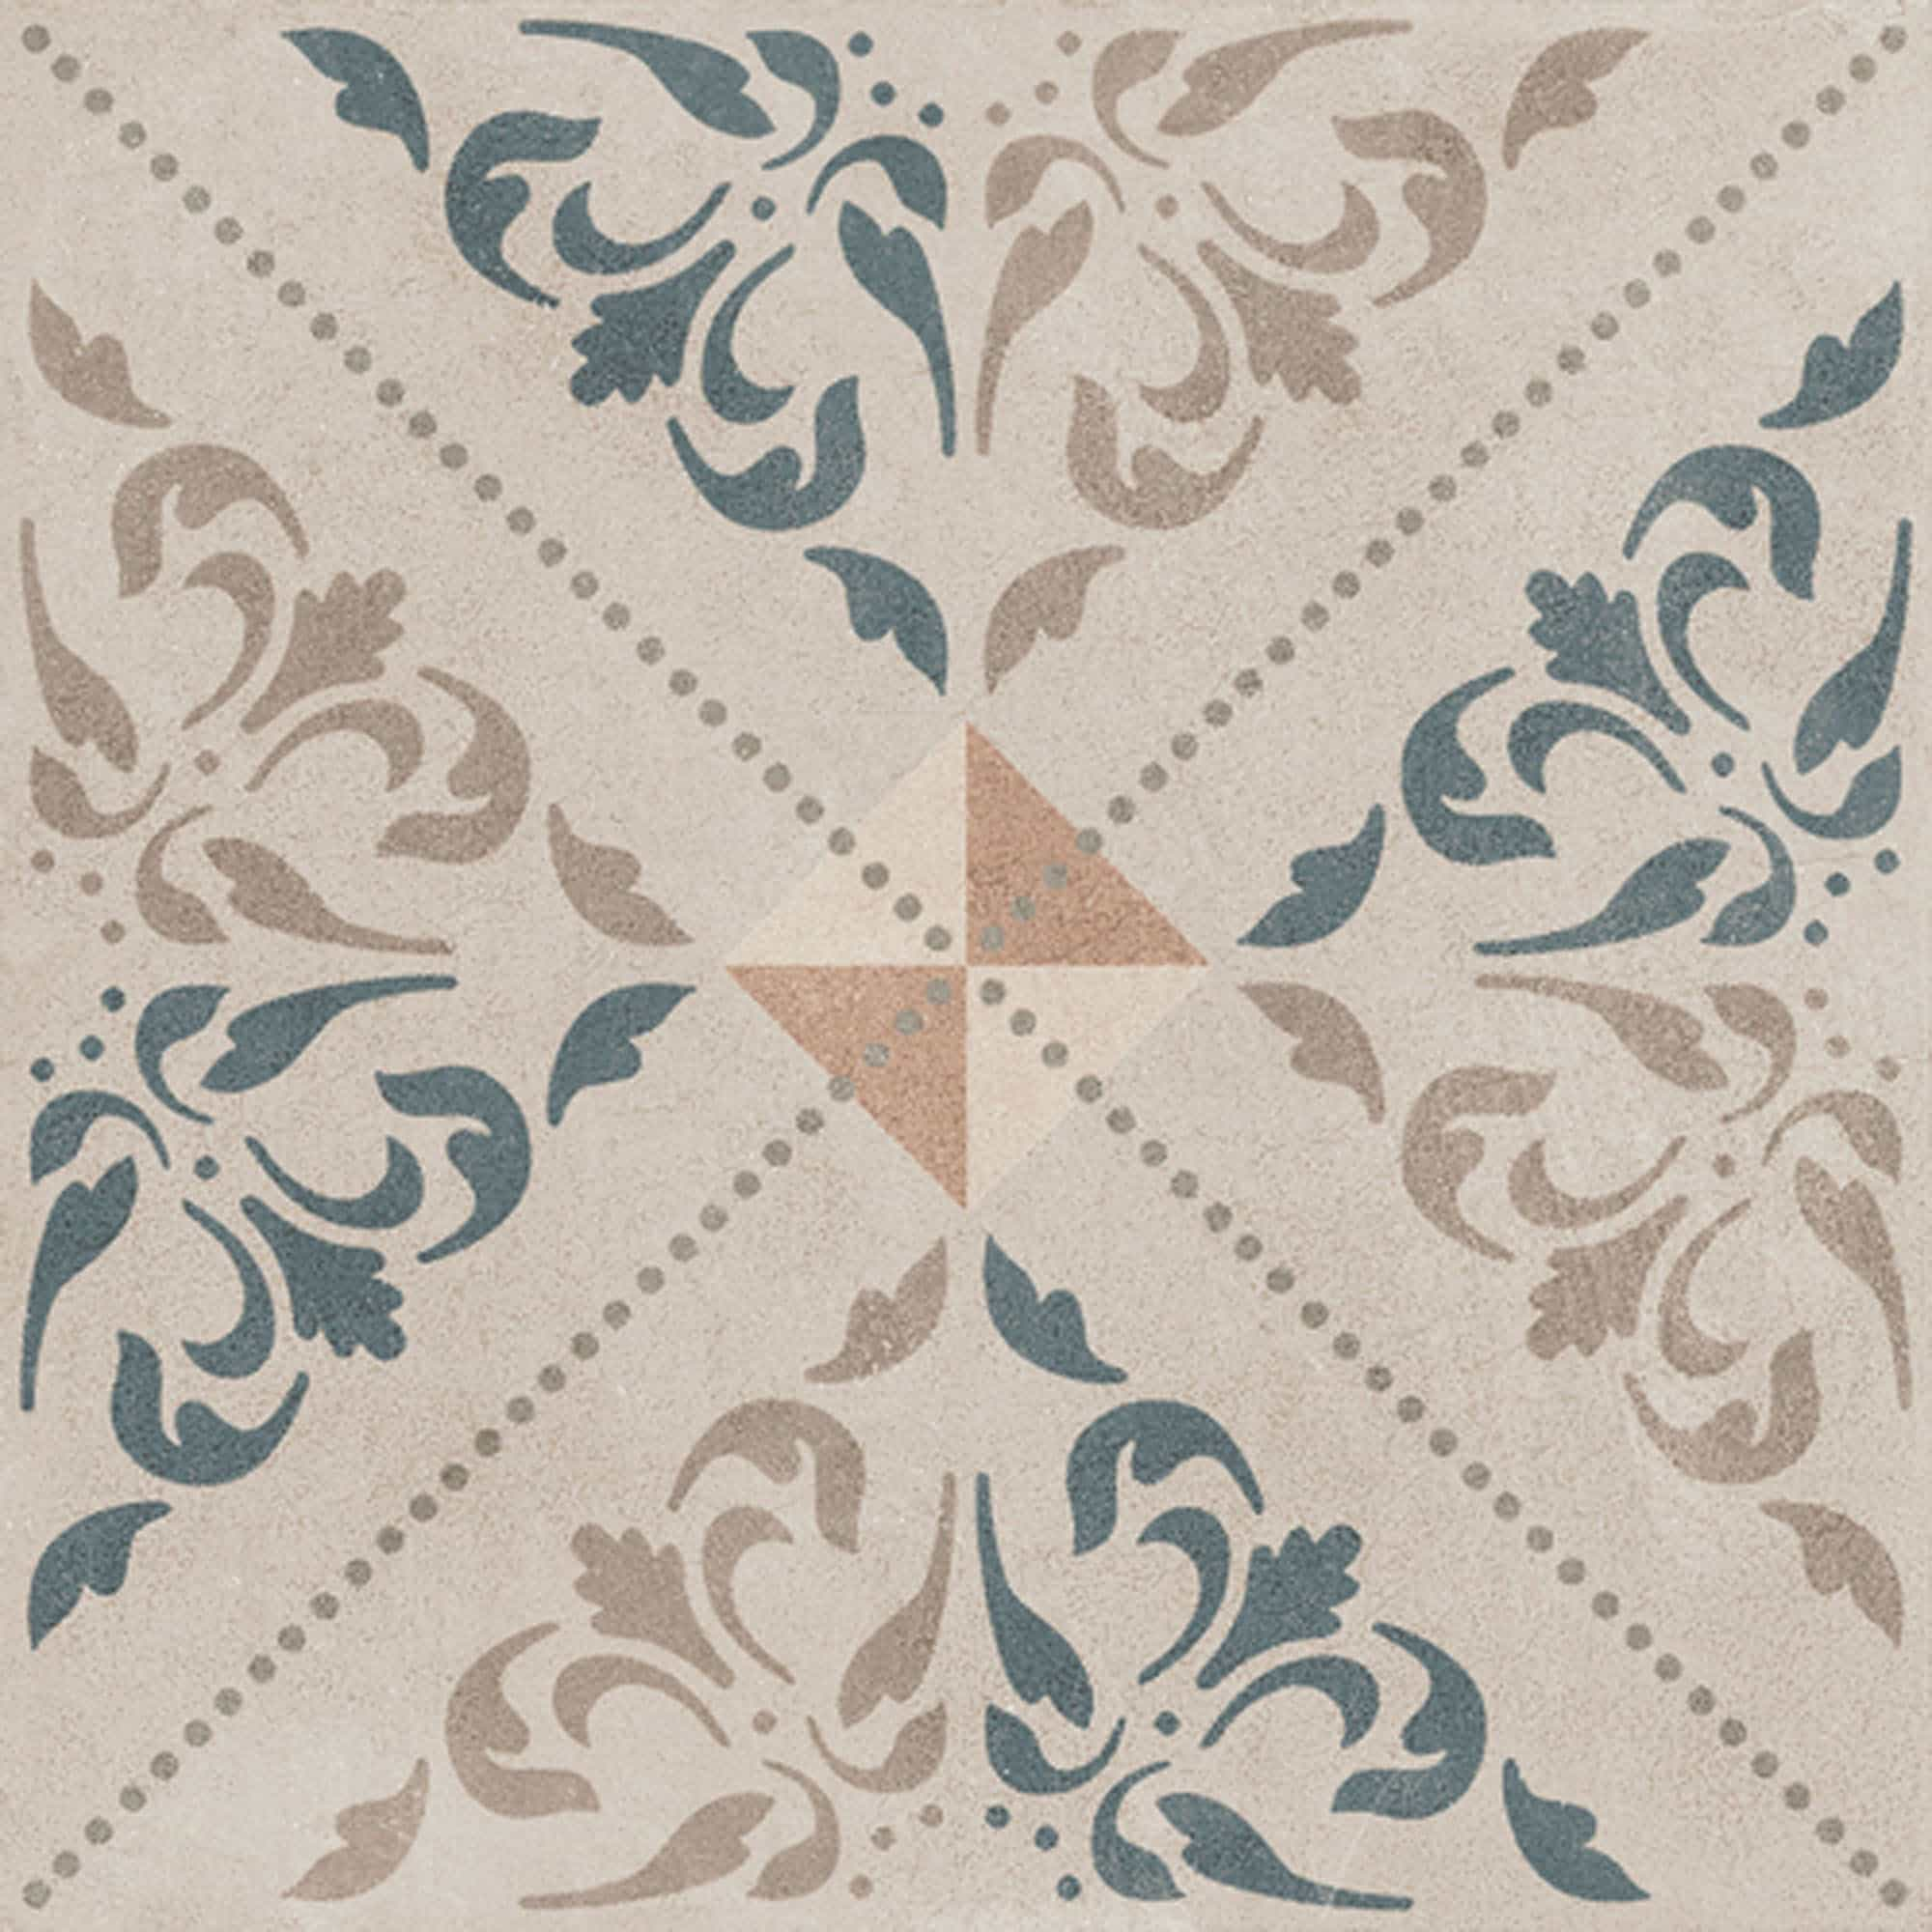 Vintage vloertegels - Patchwork Classic 02